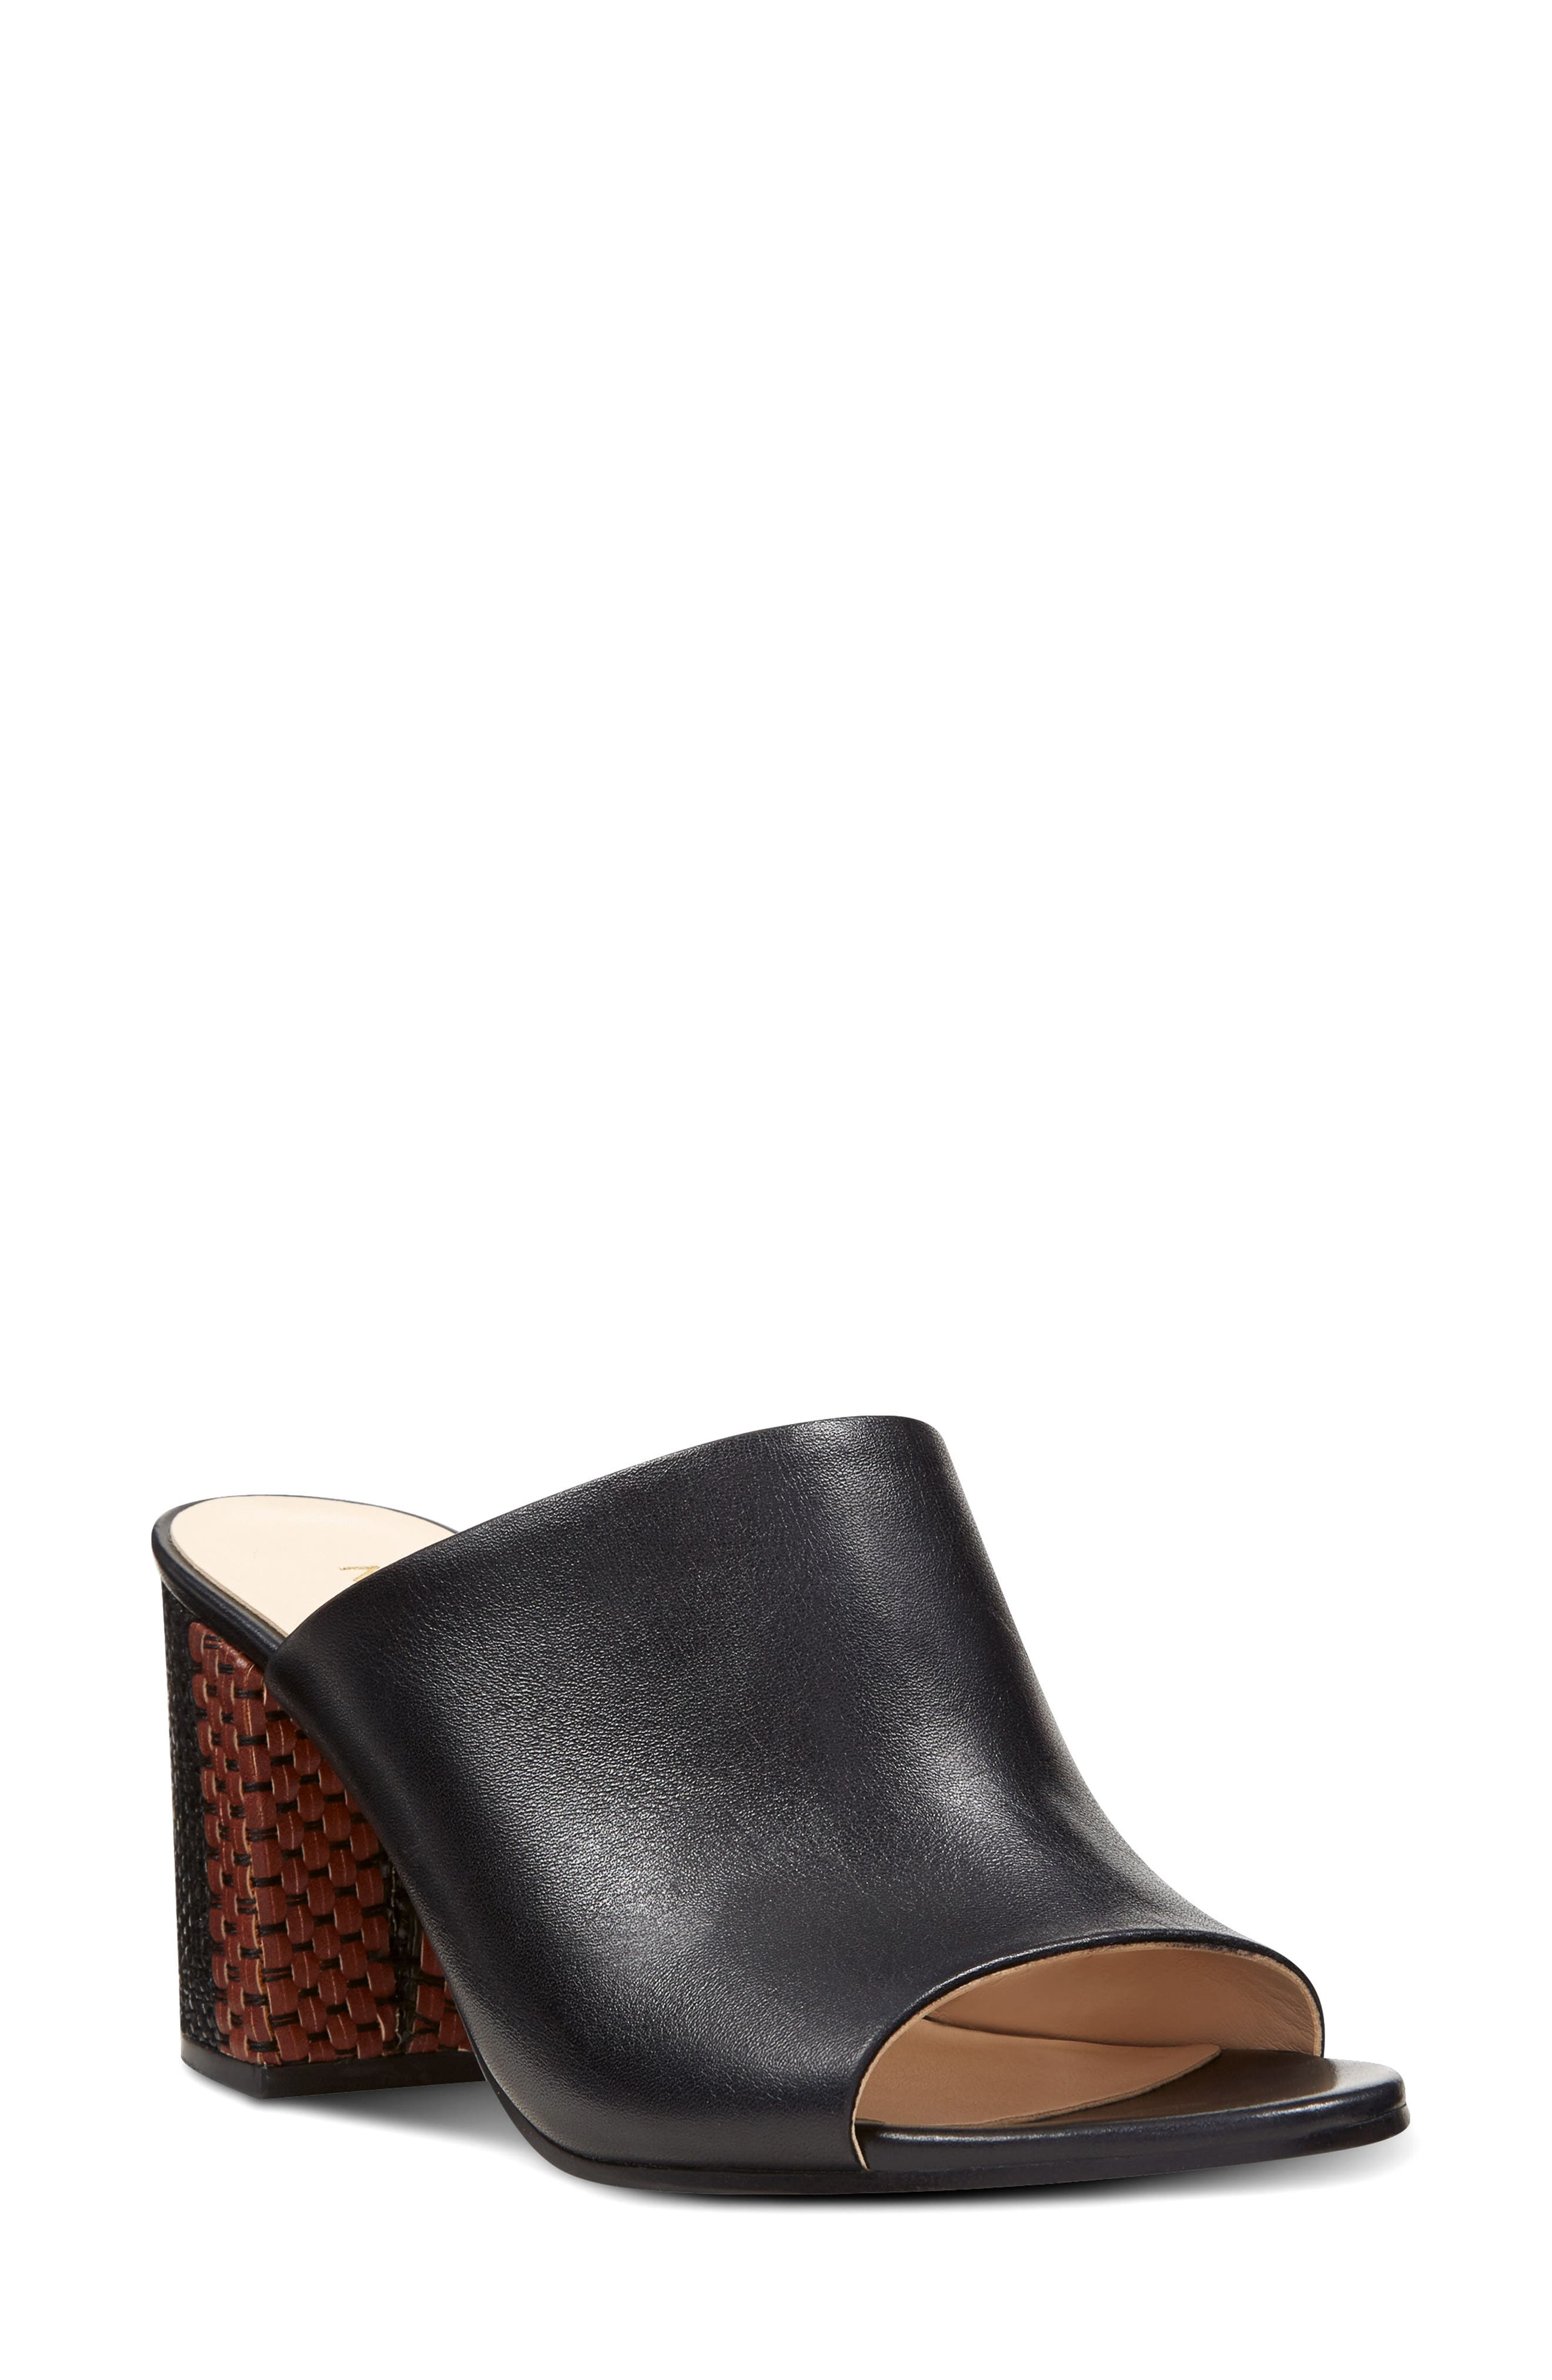 Main Image - Nine West Gemily Block Heel Slide Sandal (Women)